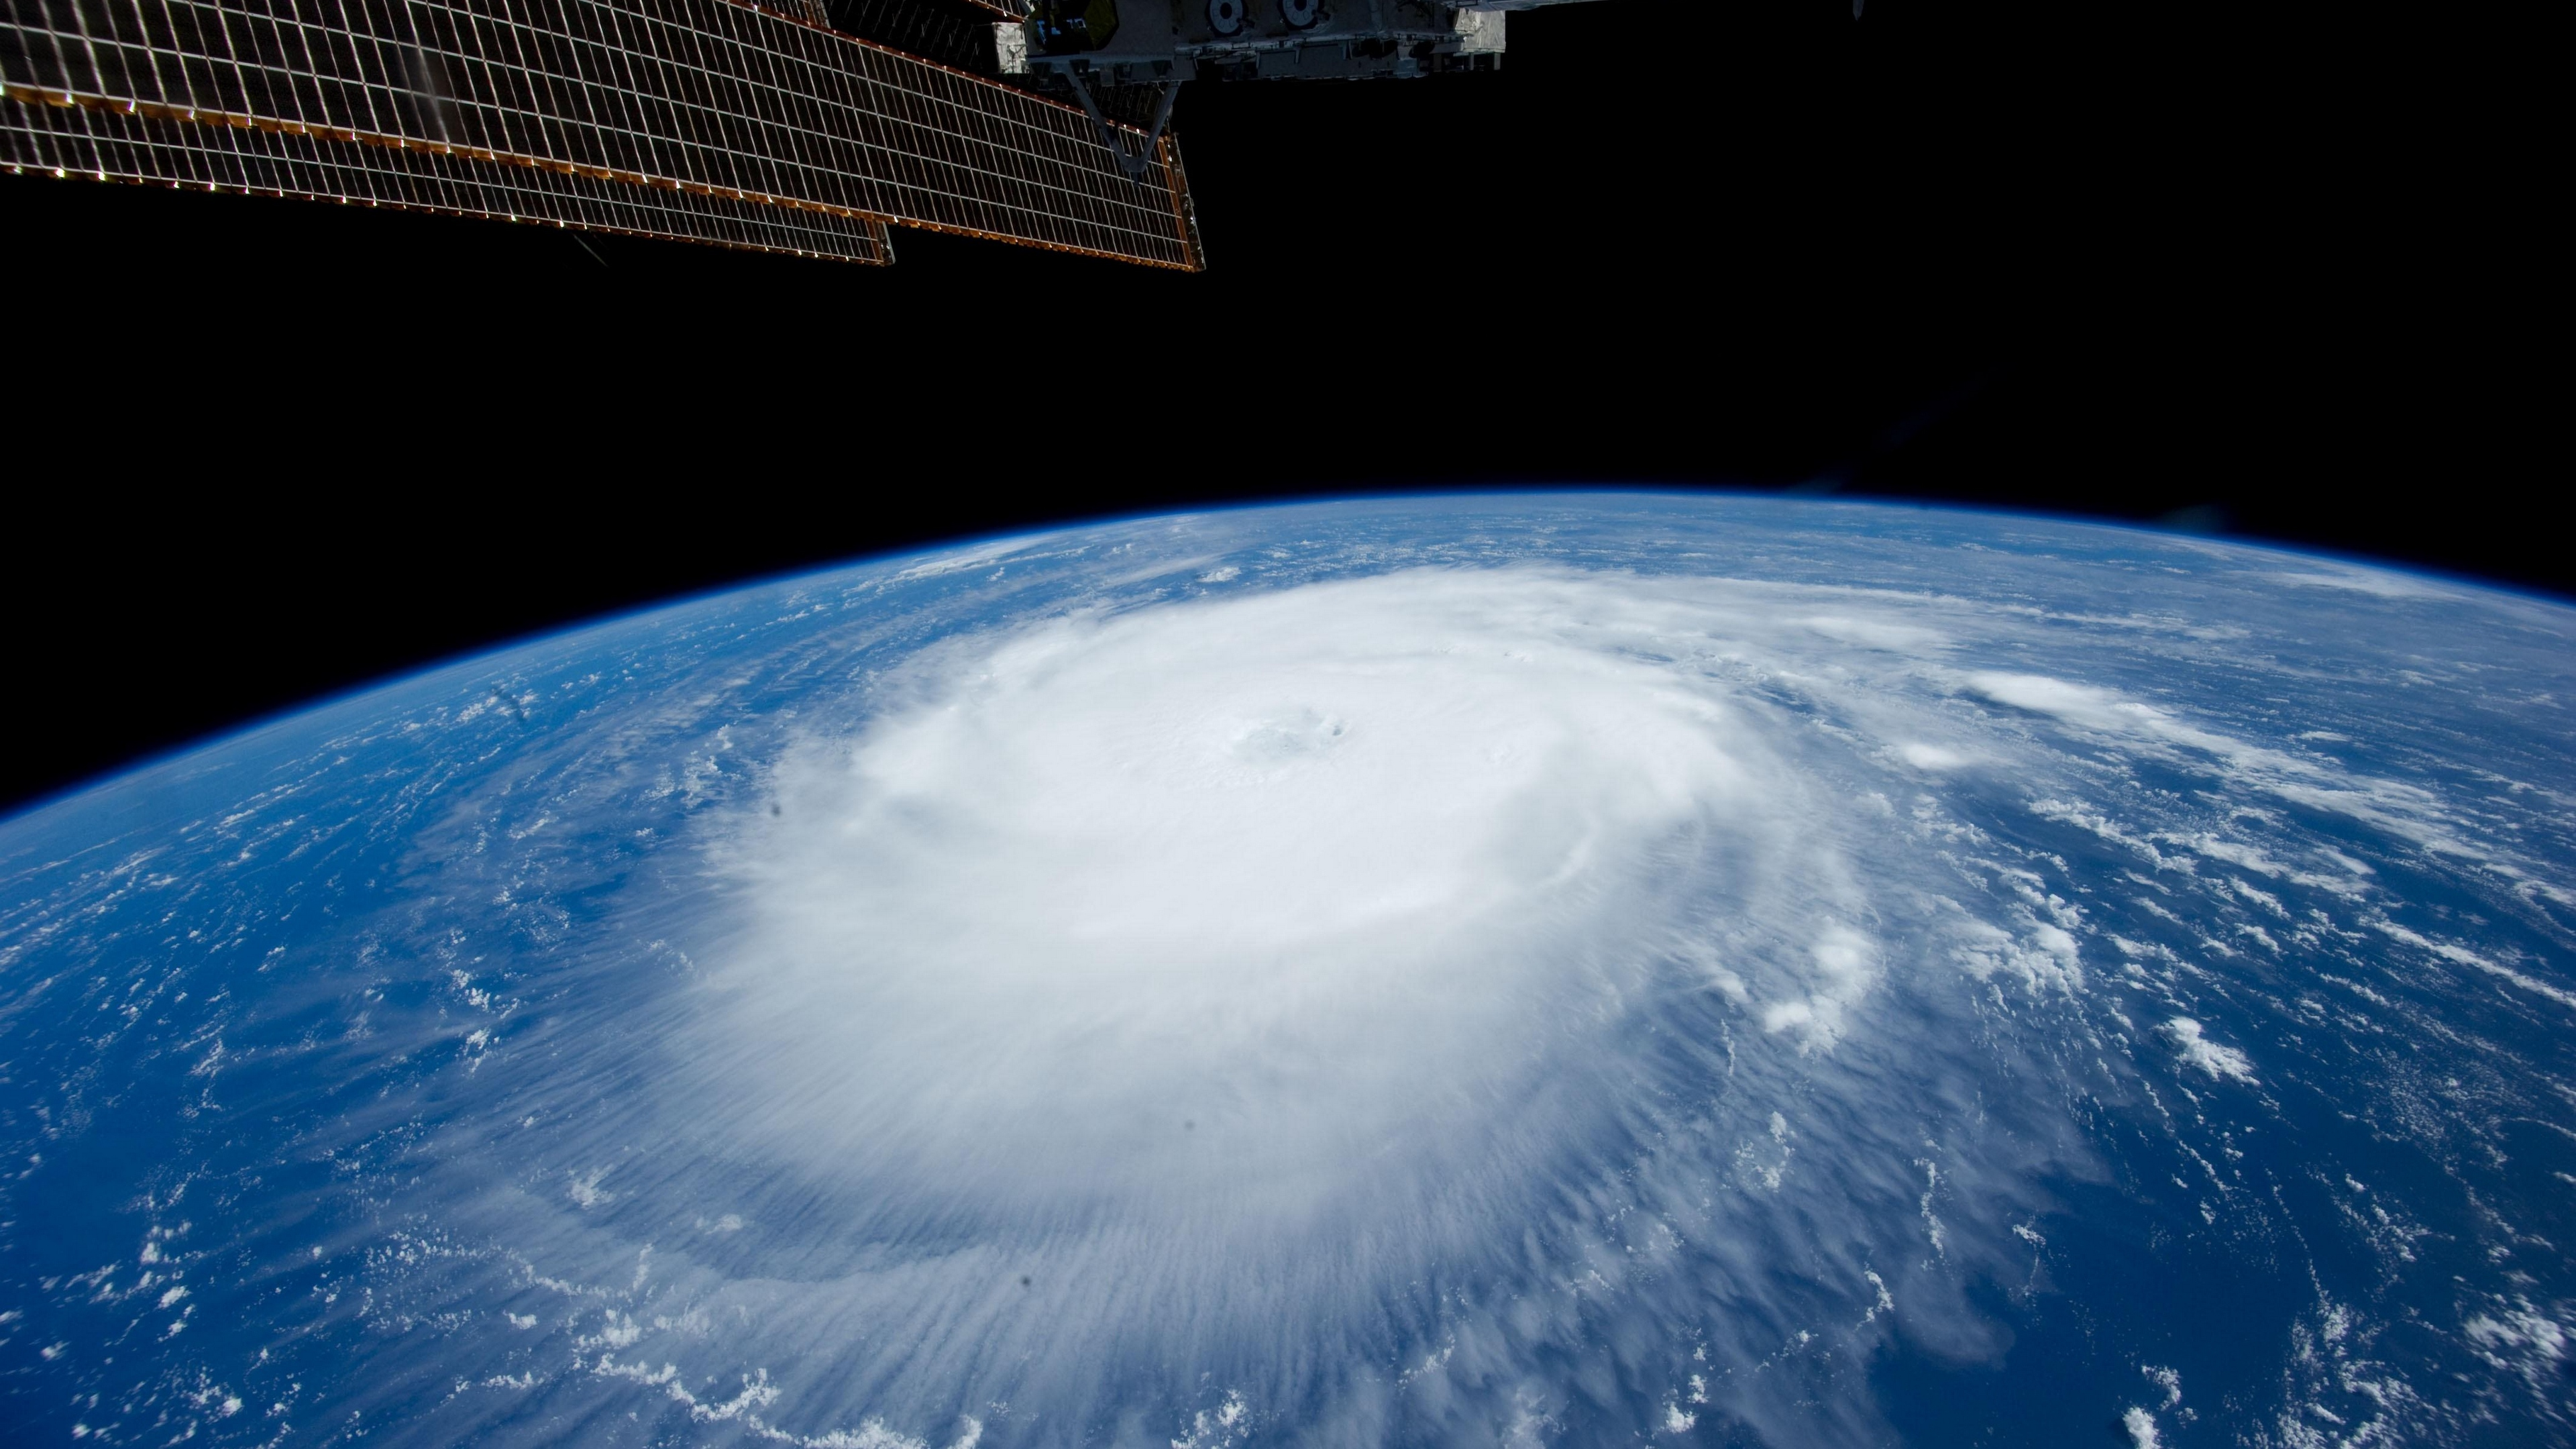 earth station whirlwind cyclone cloud 4k 1536016938 - earth, station, whirlwind, cyclone, cloud 4k - whirlwind, Station, Earth